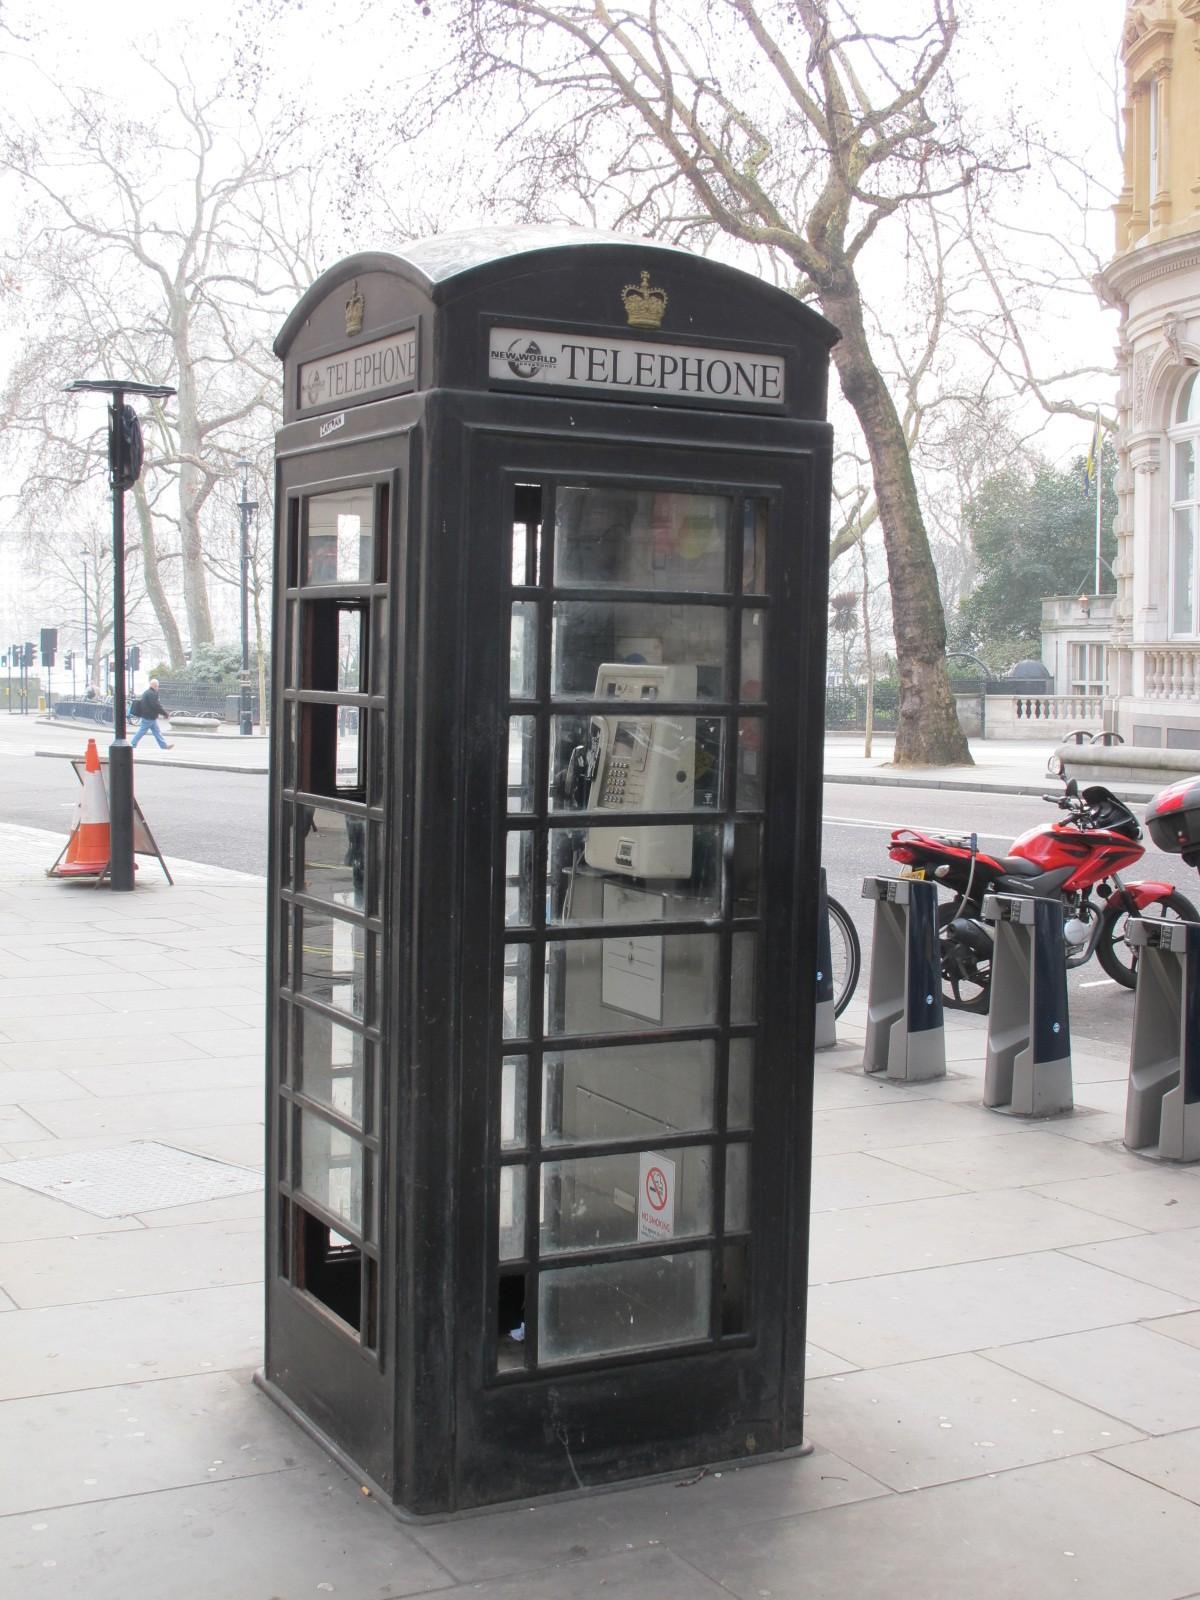 London-2012-Telephone-Booth